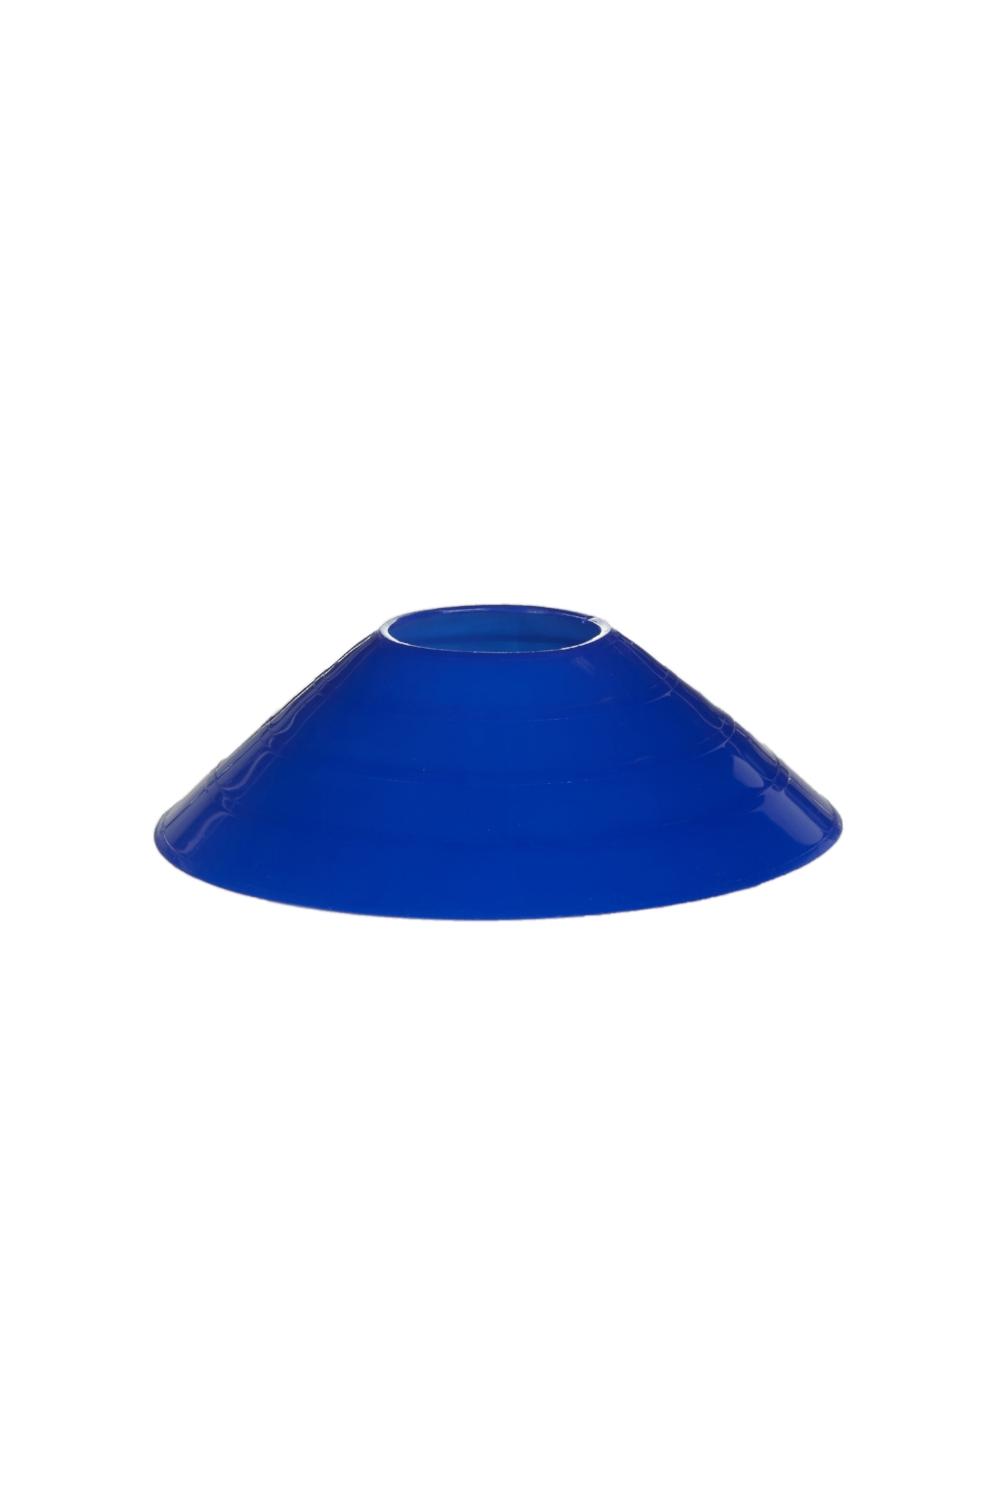 Soccer Cone Blue.jpg